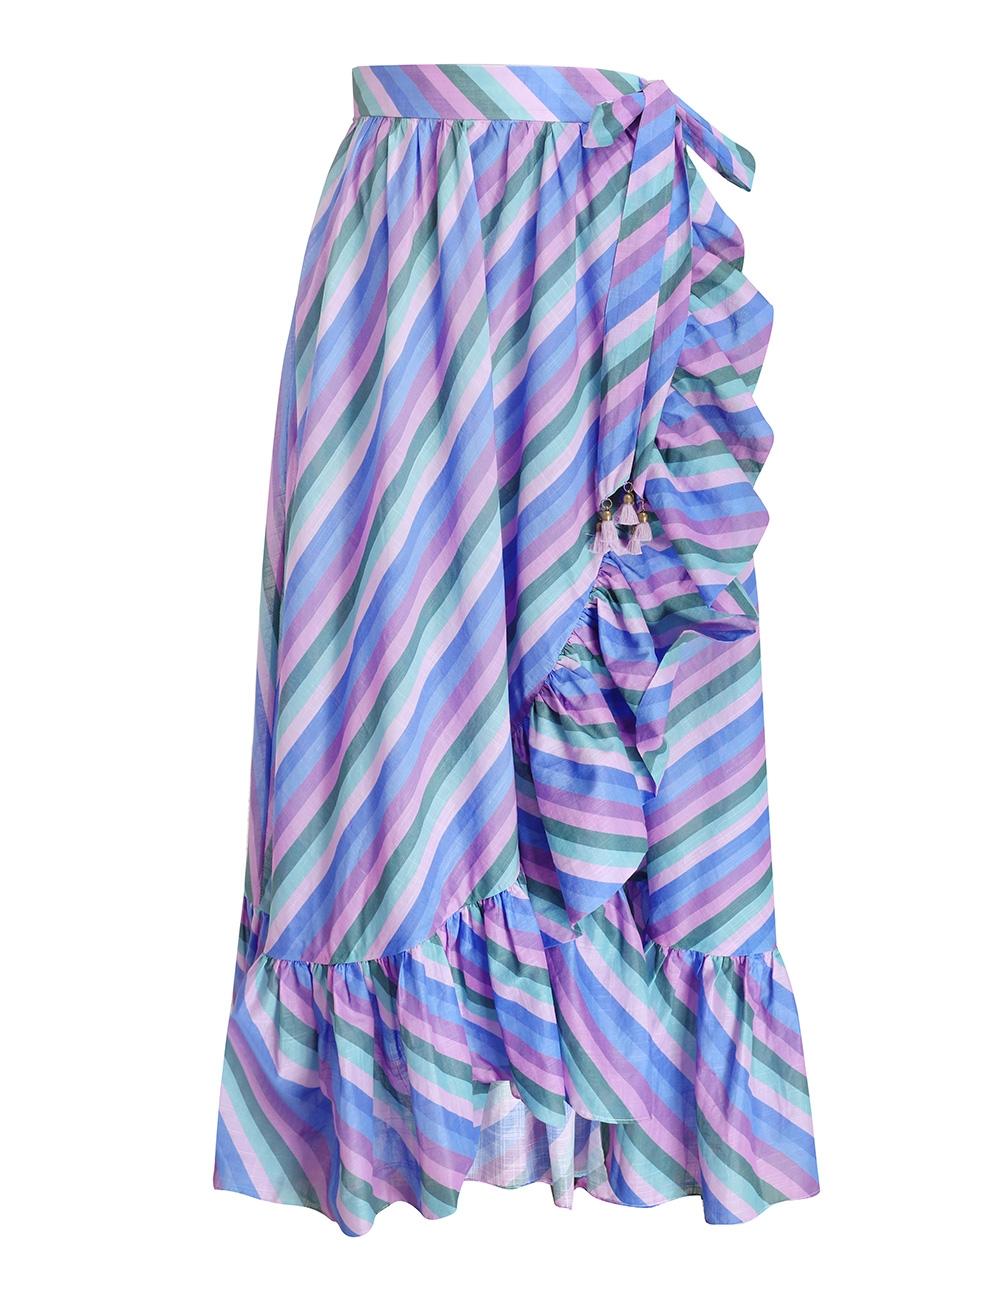 Poppy Frill Wrap Midi Skirt